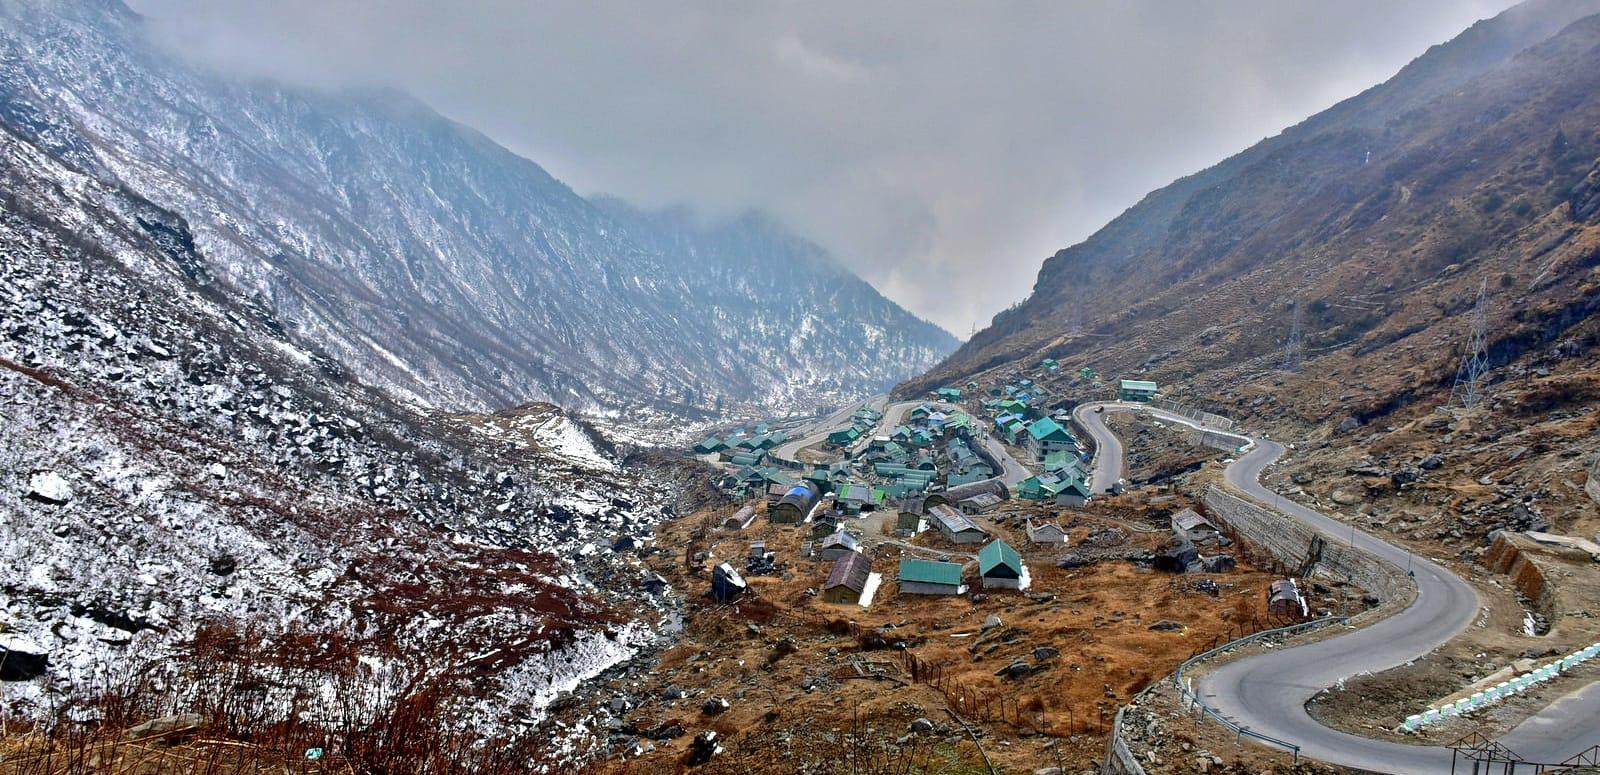 20 Best Places to Visit in Gangtok and Darjeeling - 2019